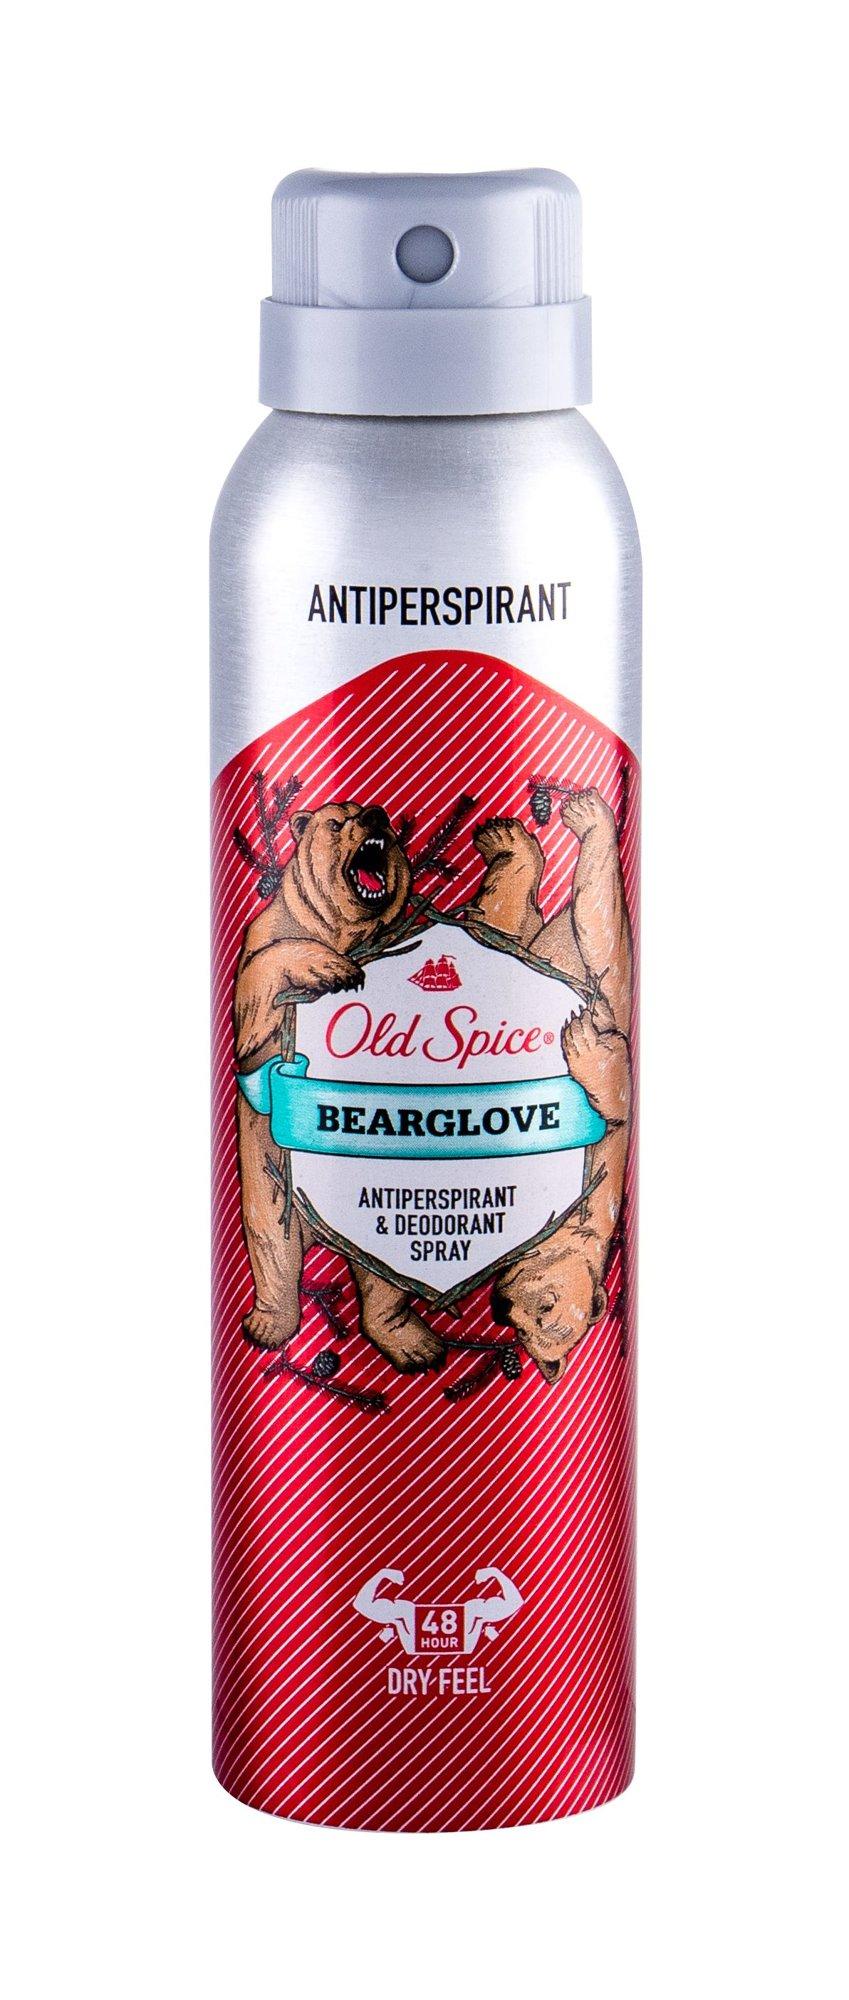 Antisperantas Old Spice Bearglove